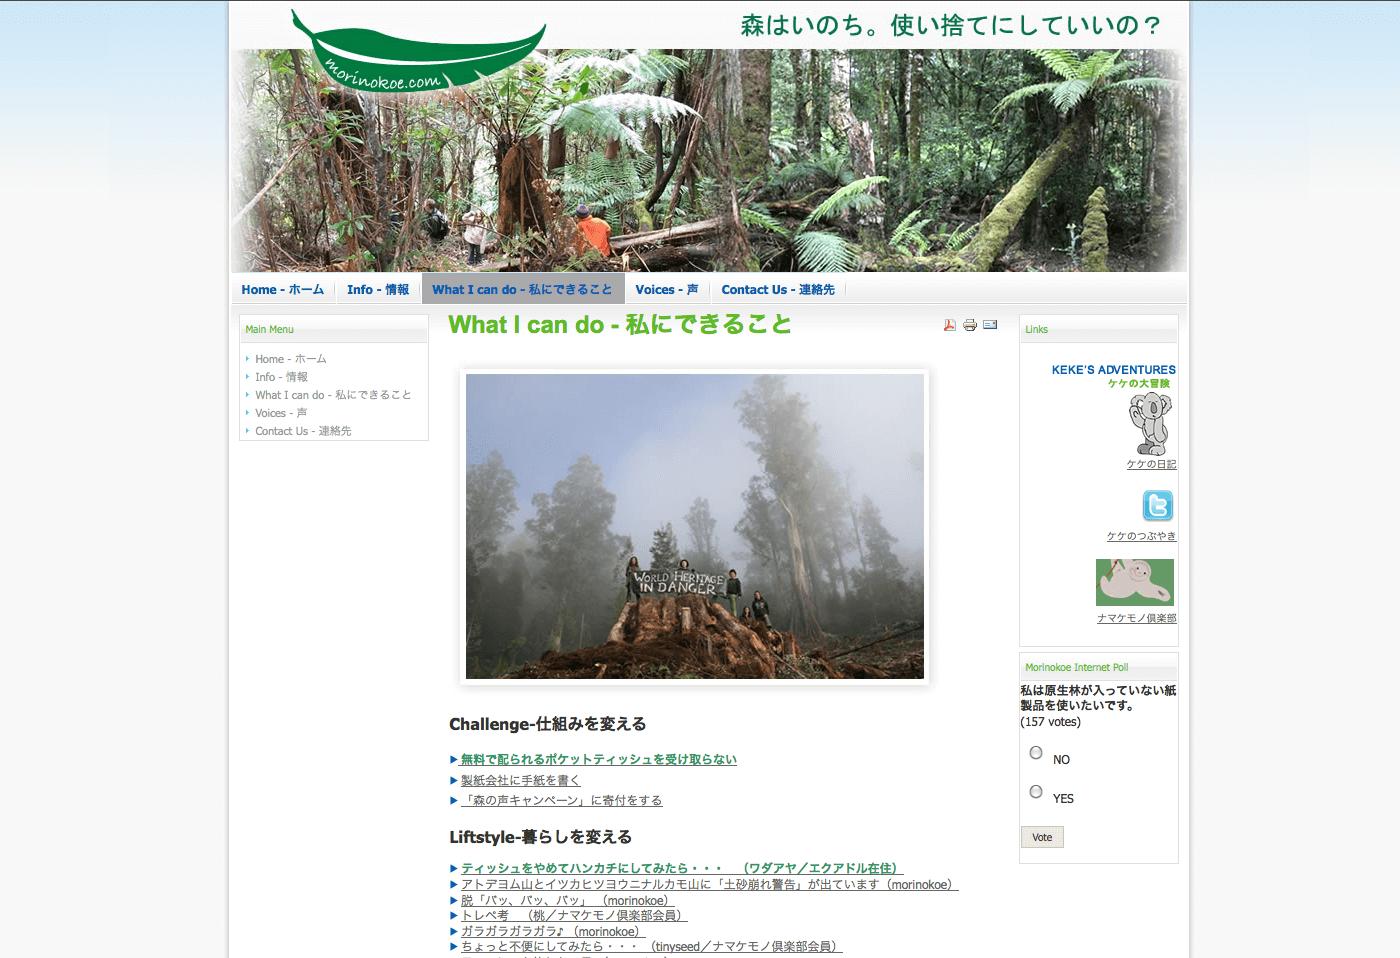 Able Video Morinokoe Website 02